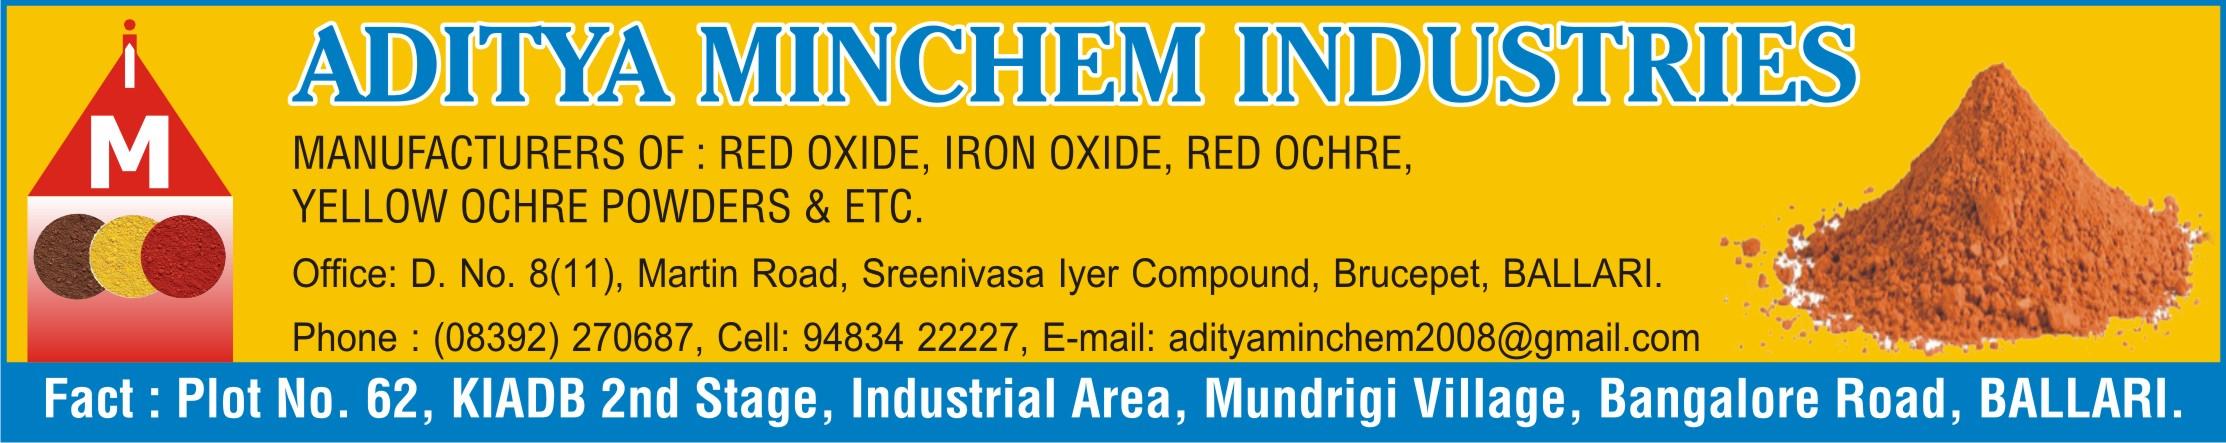 Aditya Minchem Industries